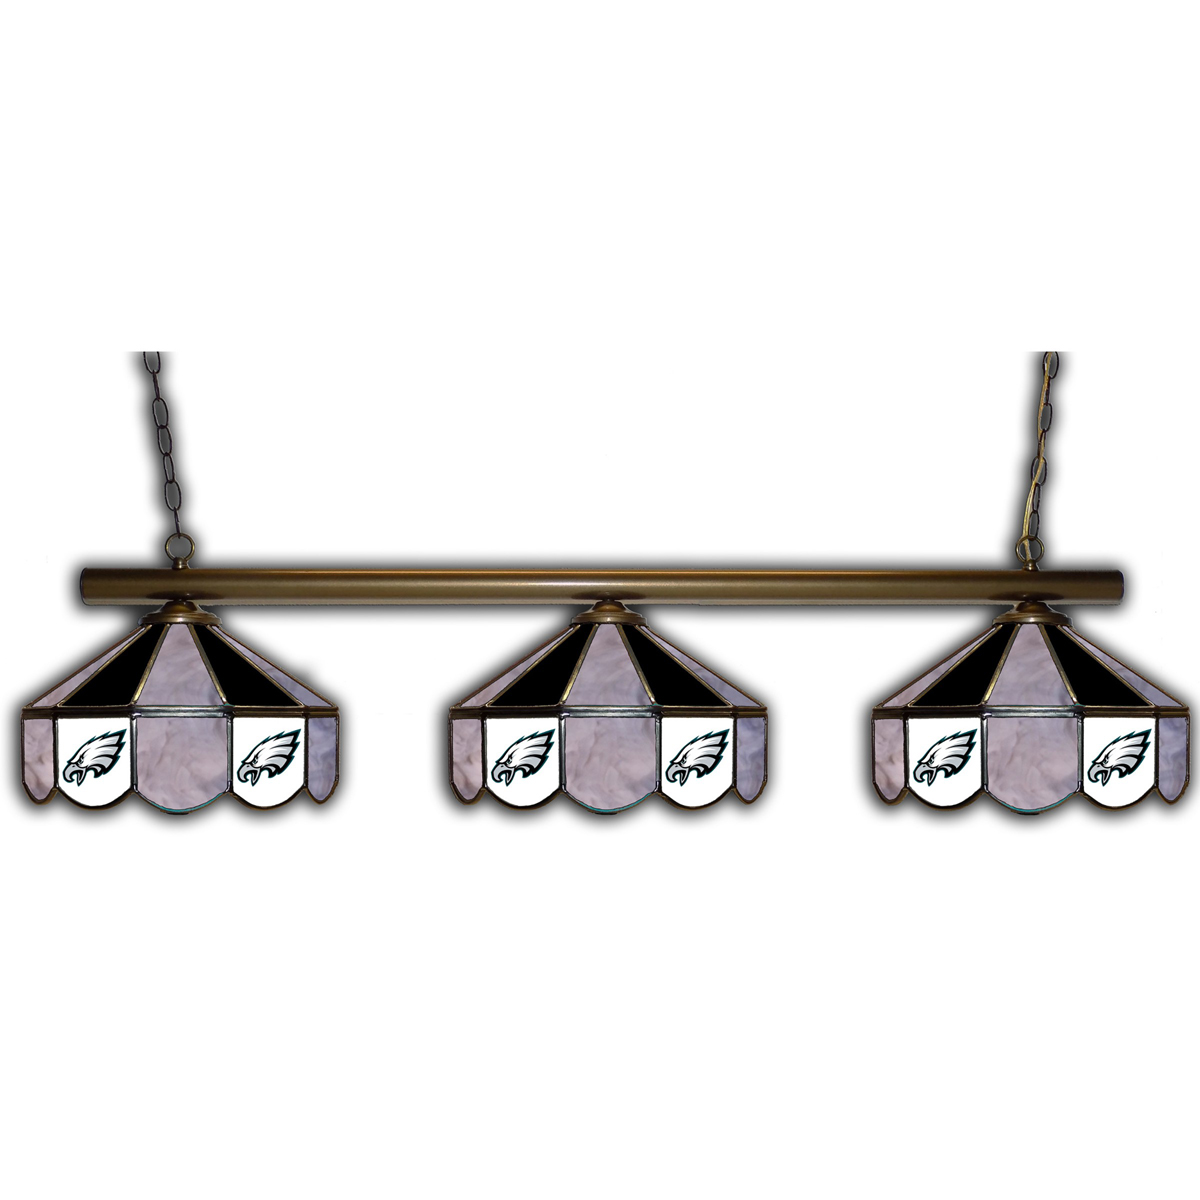 PHILADELPHIA EAGLES 3 SHADE GLASS LAMP